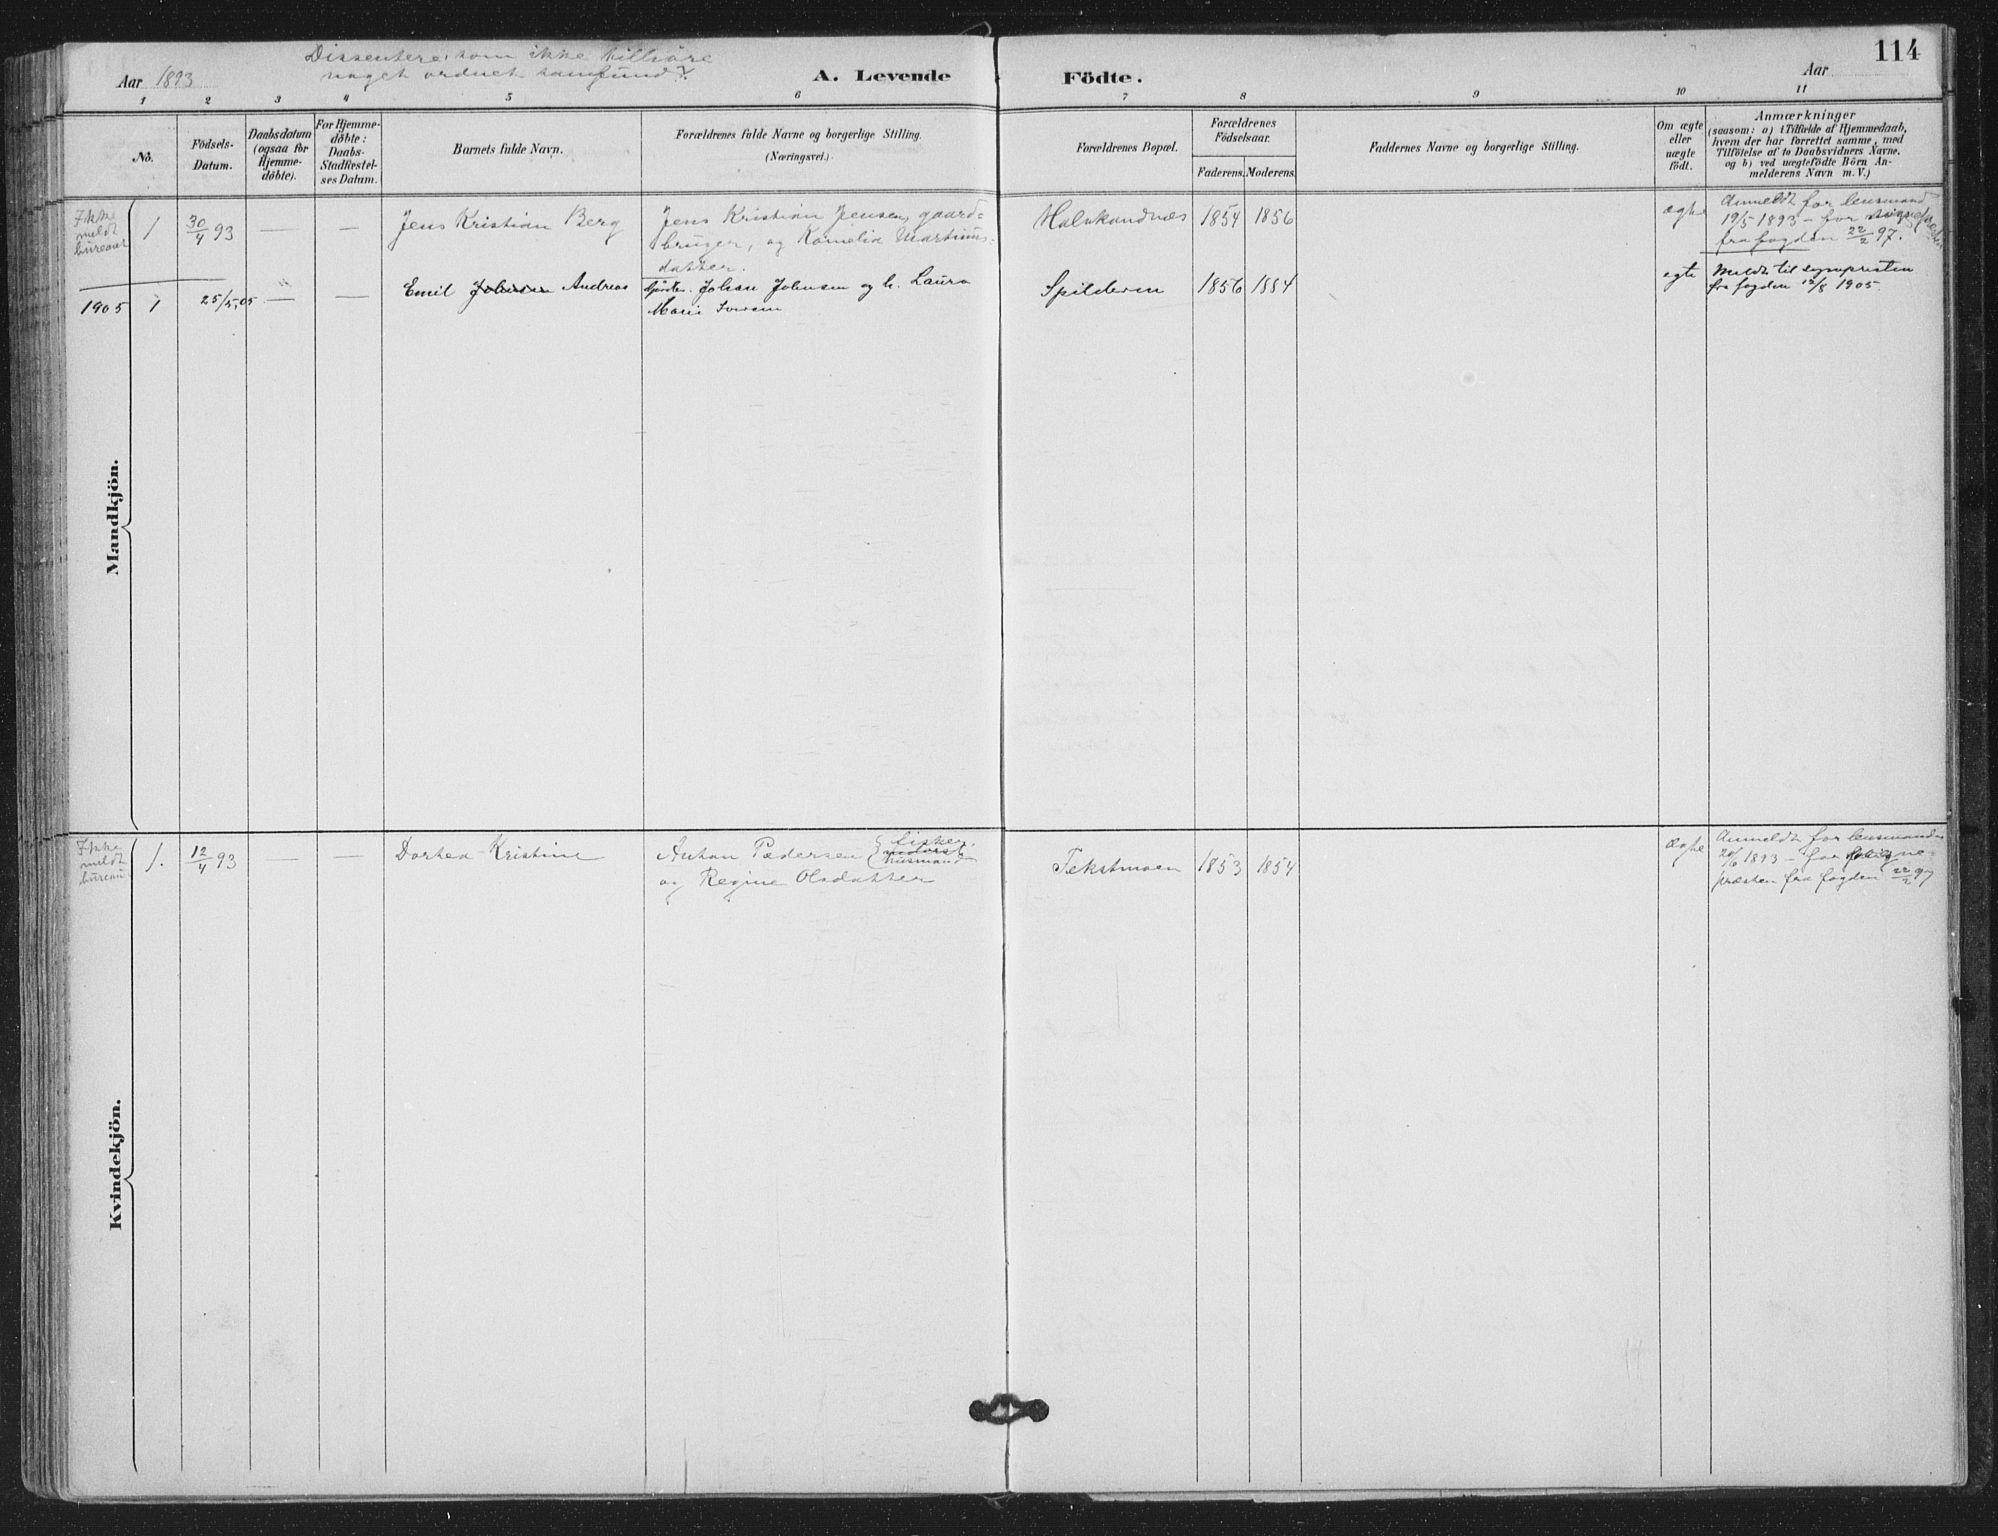 SAT, Ministerialprotokoller, klokkerbøker og fødselsregistre - Nordland, 843/L0628: Ministerialbok nr. 843A03, 1889-1907, s. 114